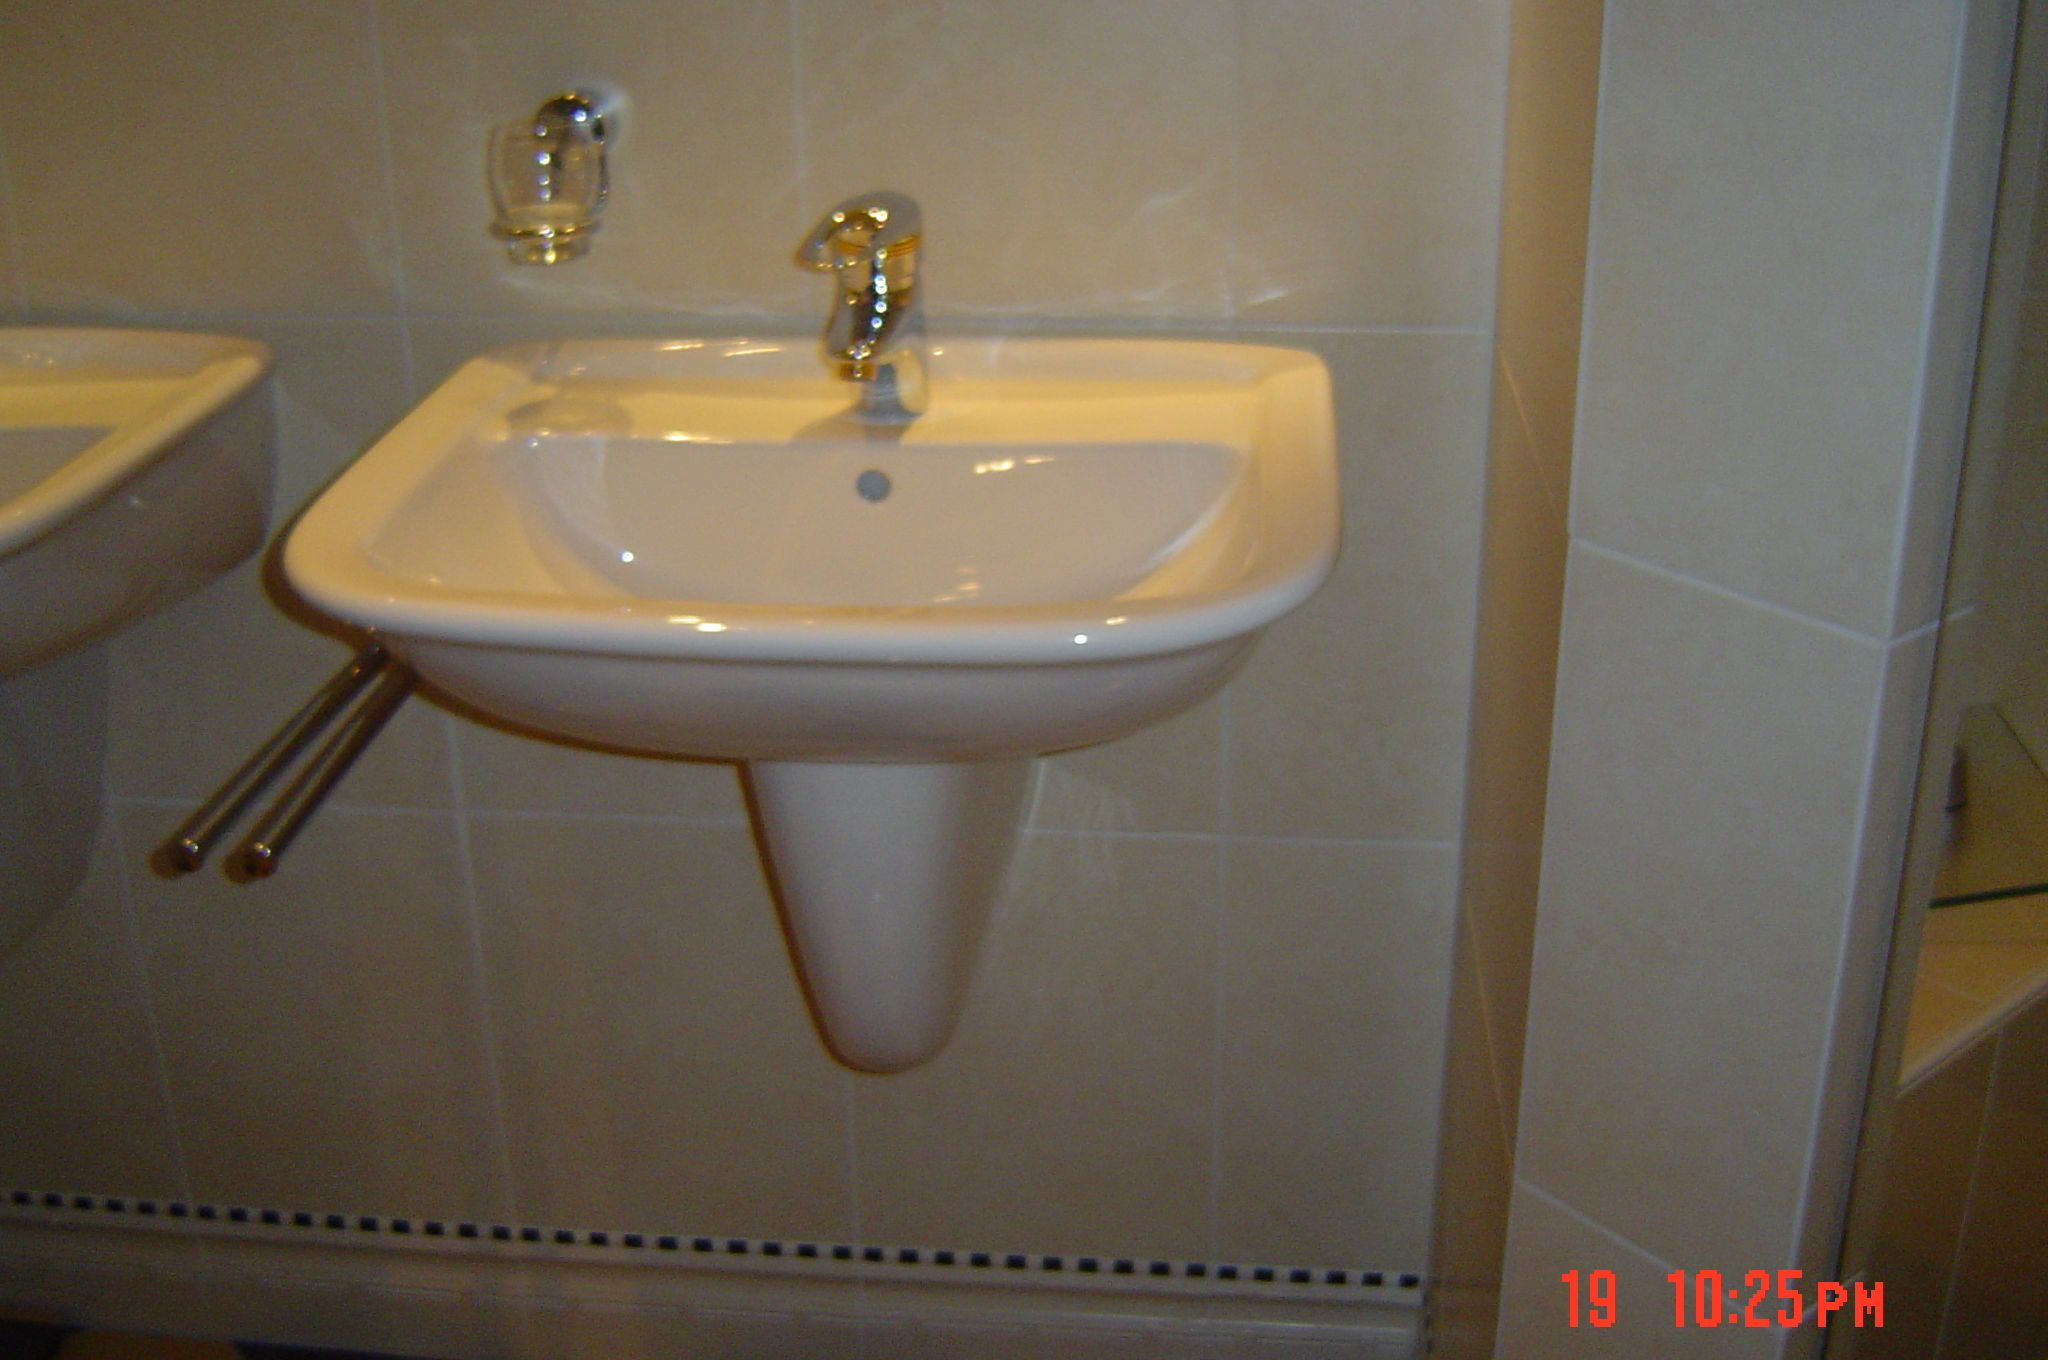 Showroombadkamers Nl Villeroy Amp Boch Wastafel 28480